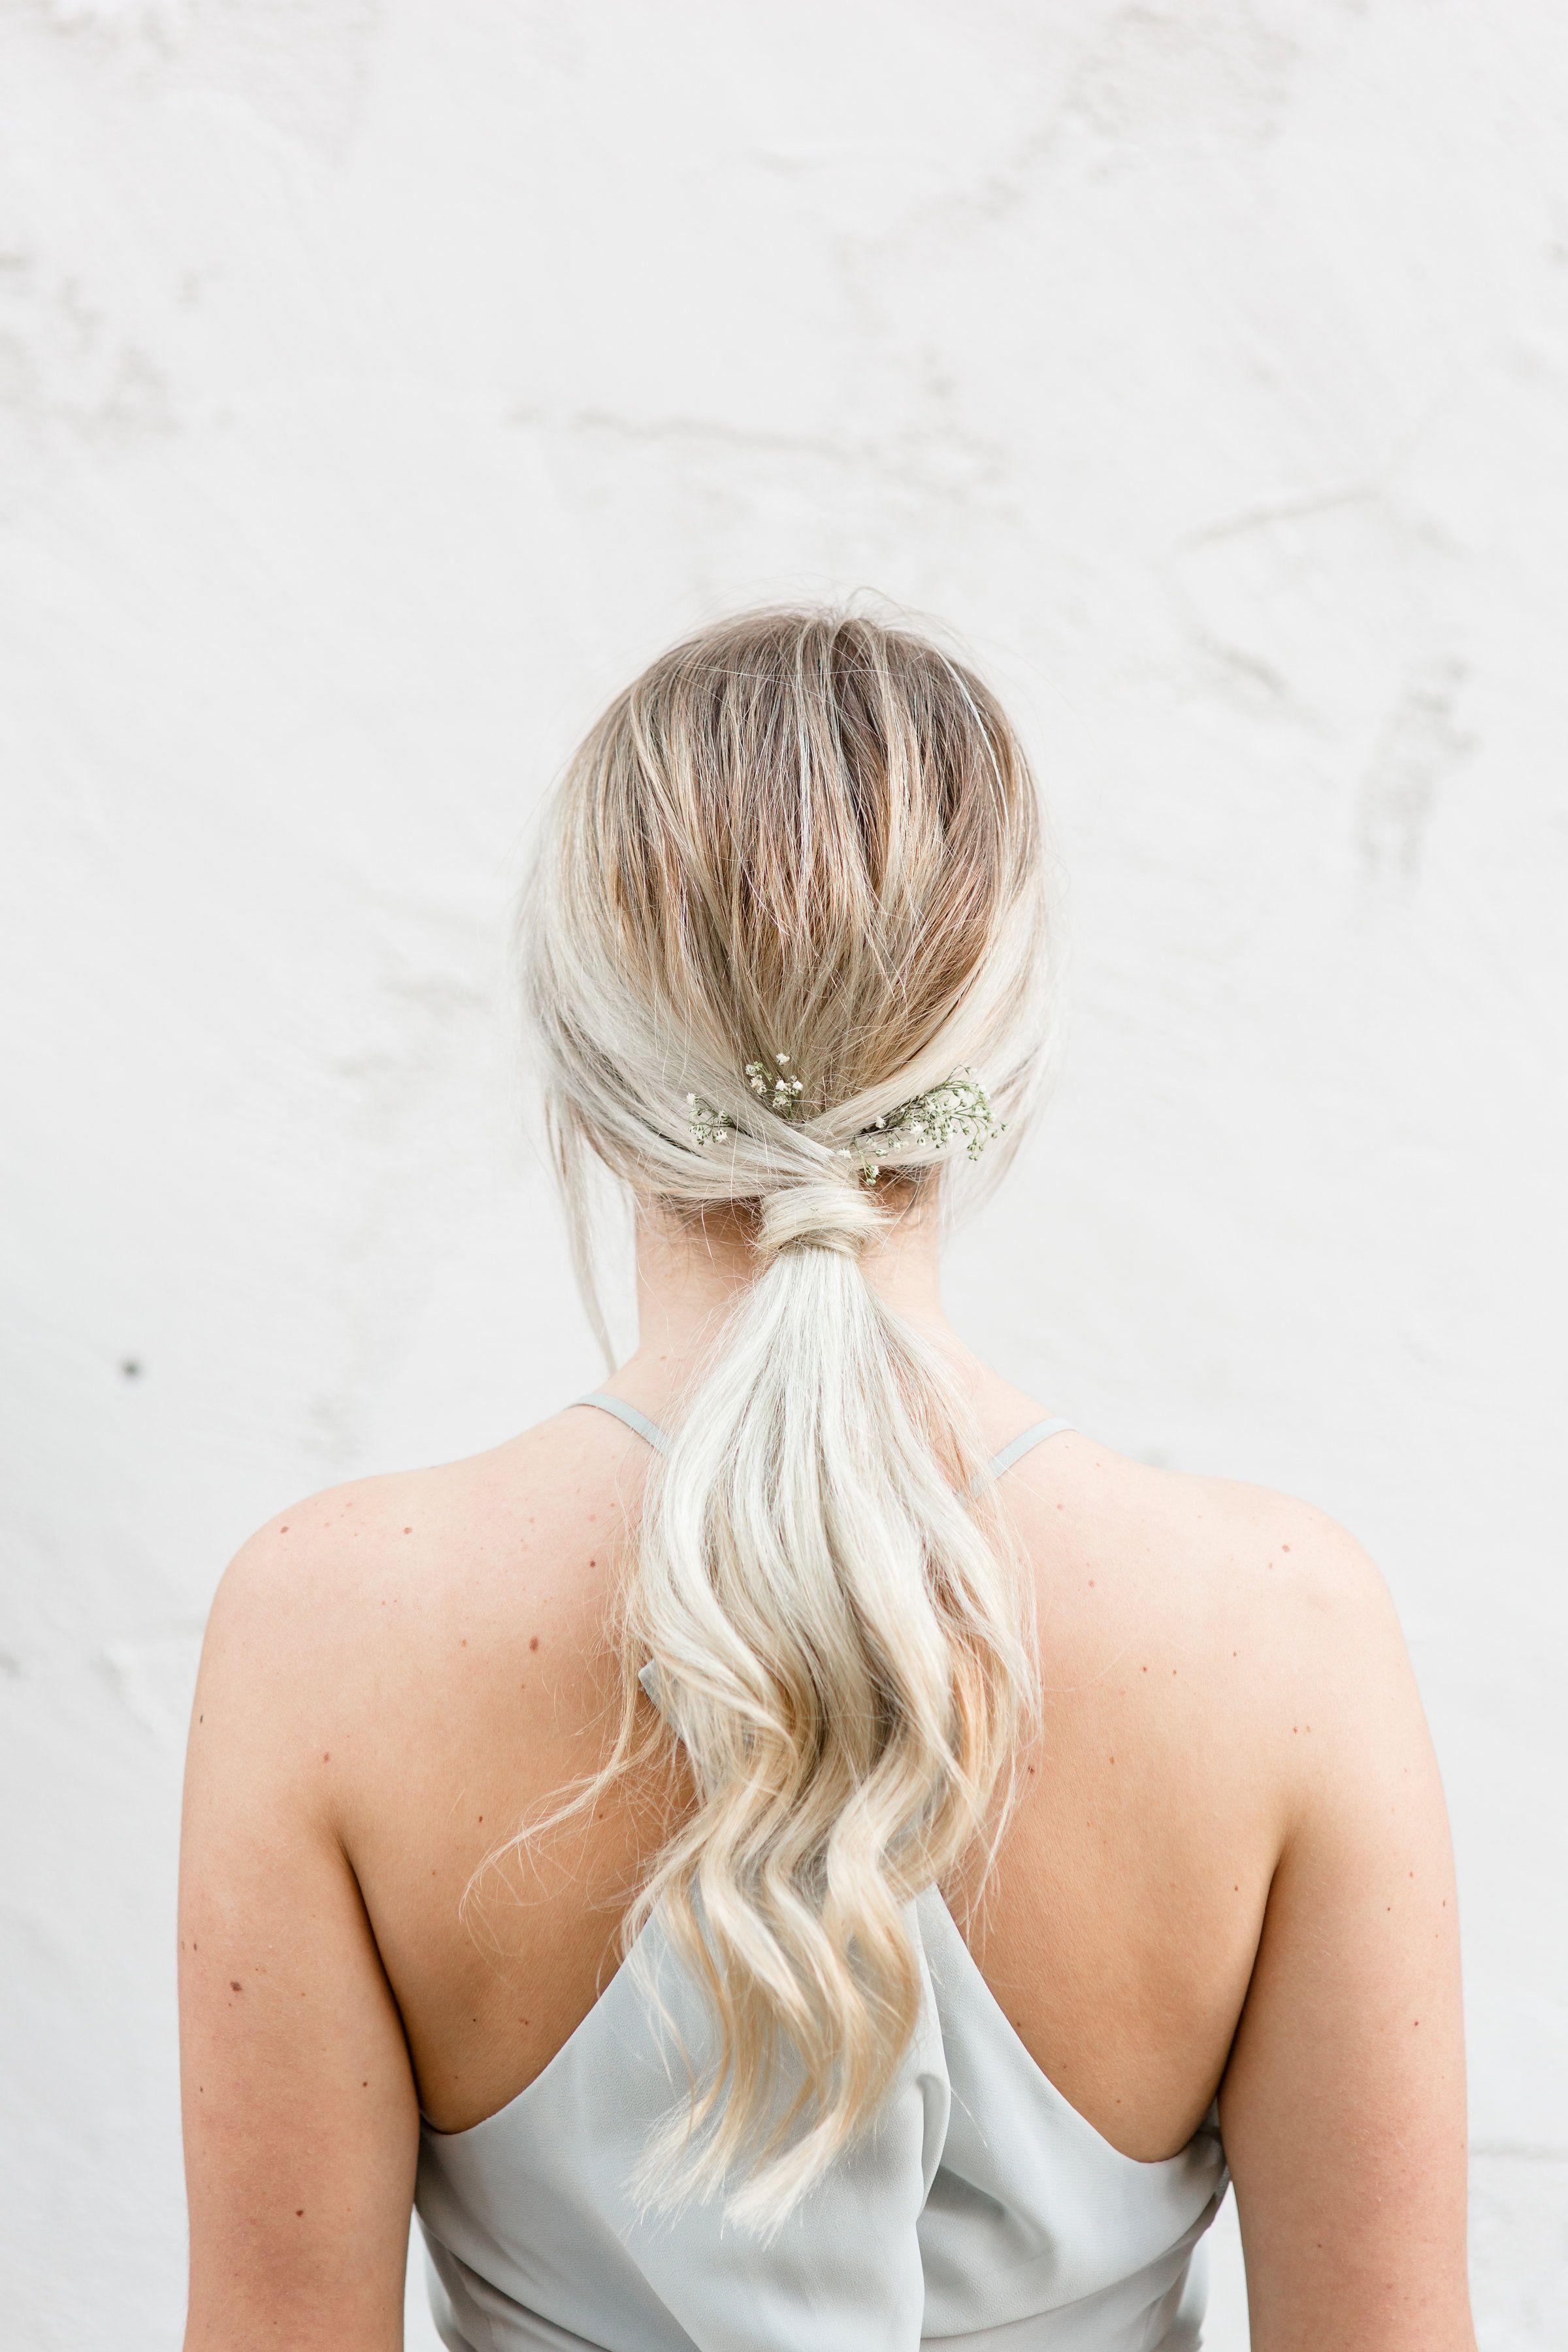 Sleek ponytail hairstyle for a minimalist urban wedding. // Luce ...